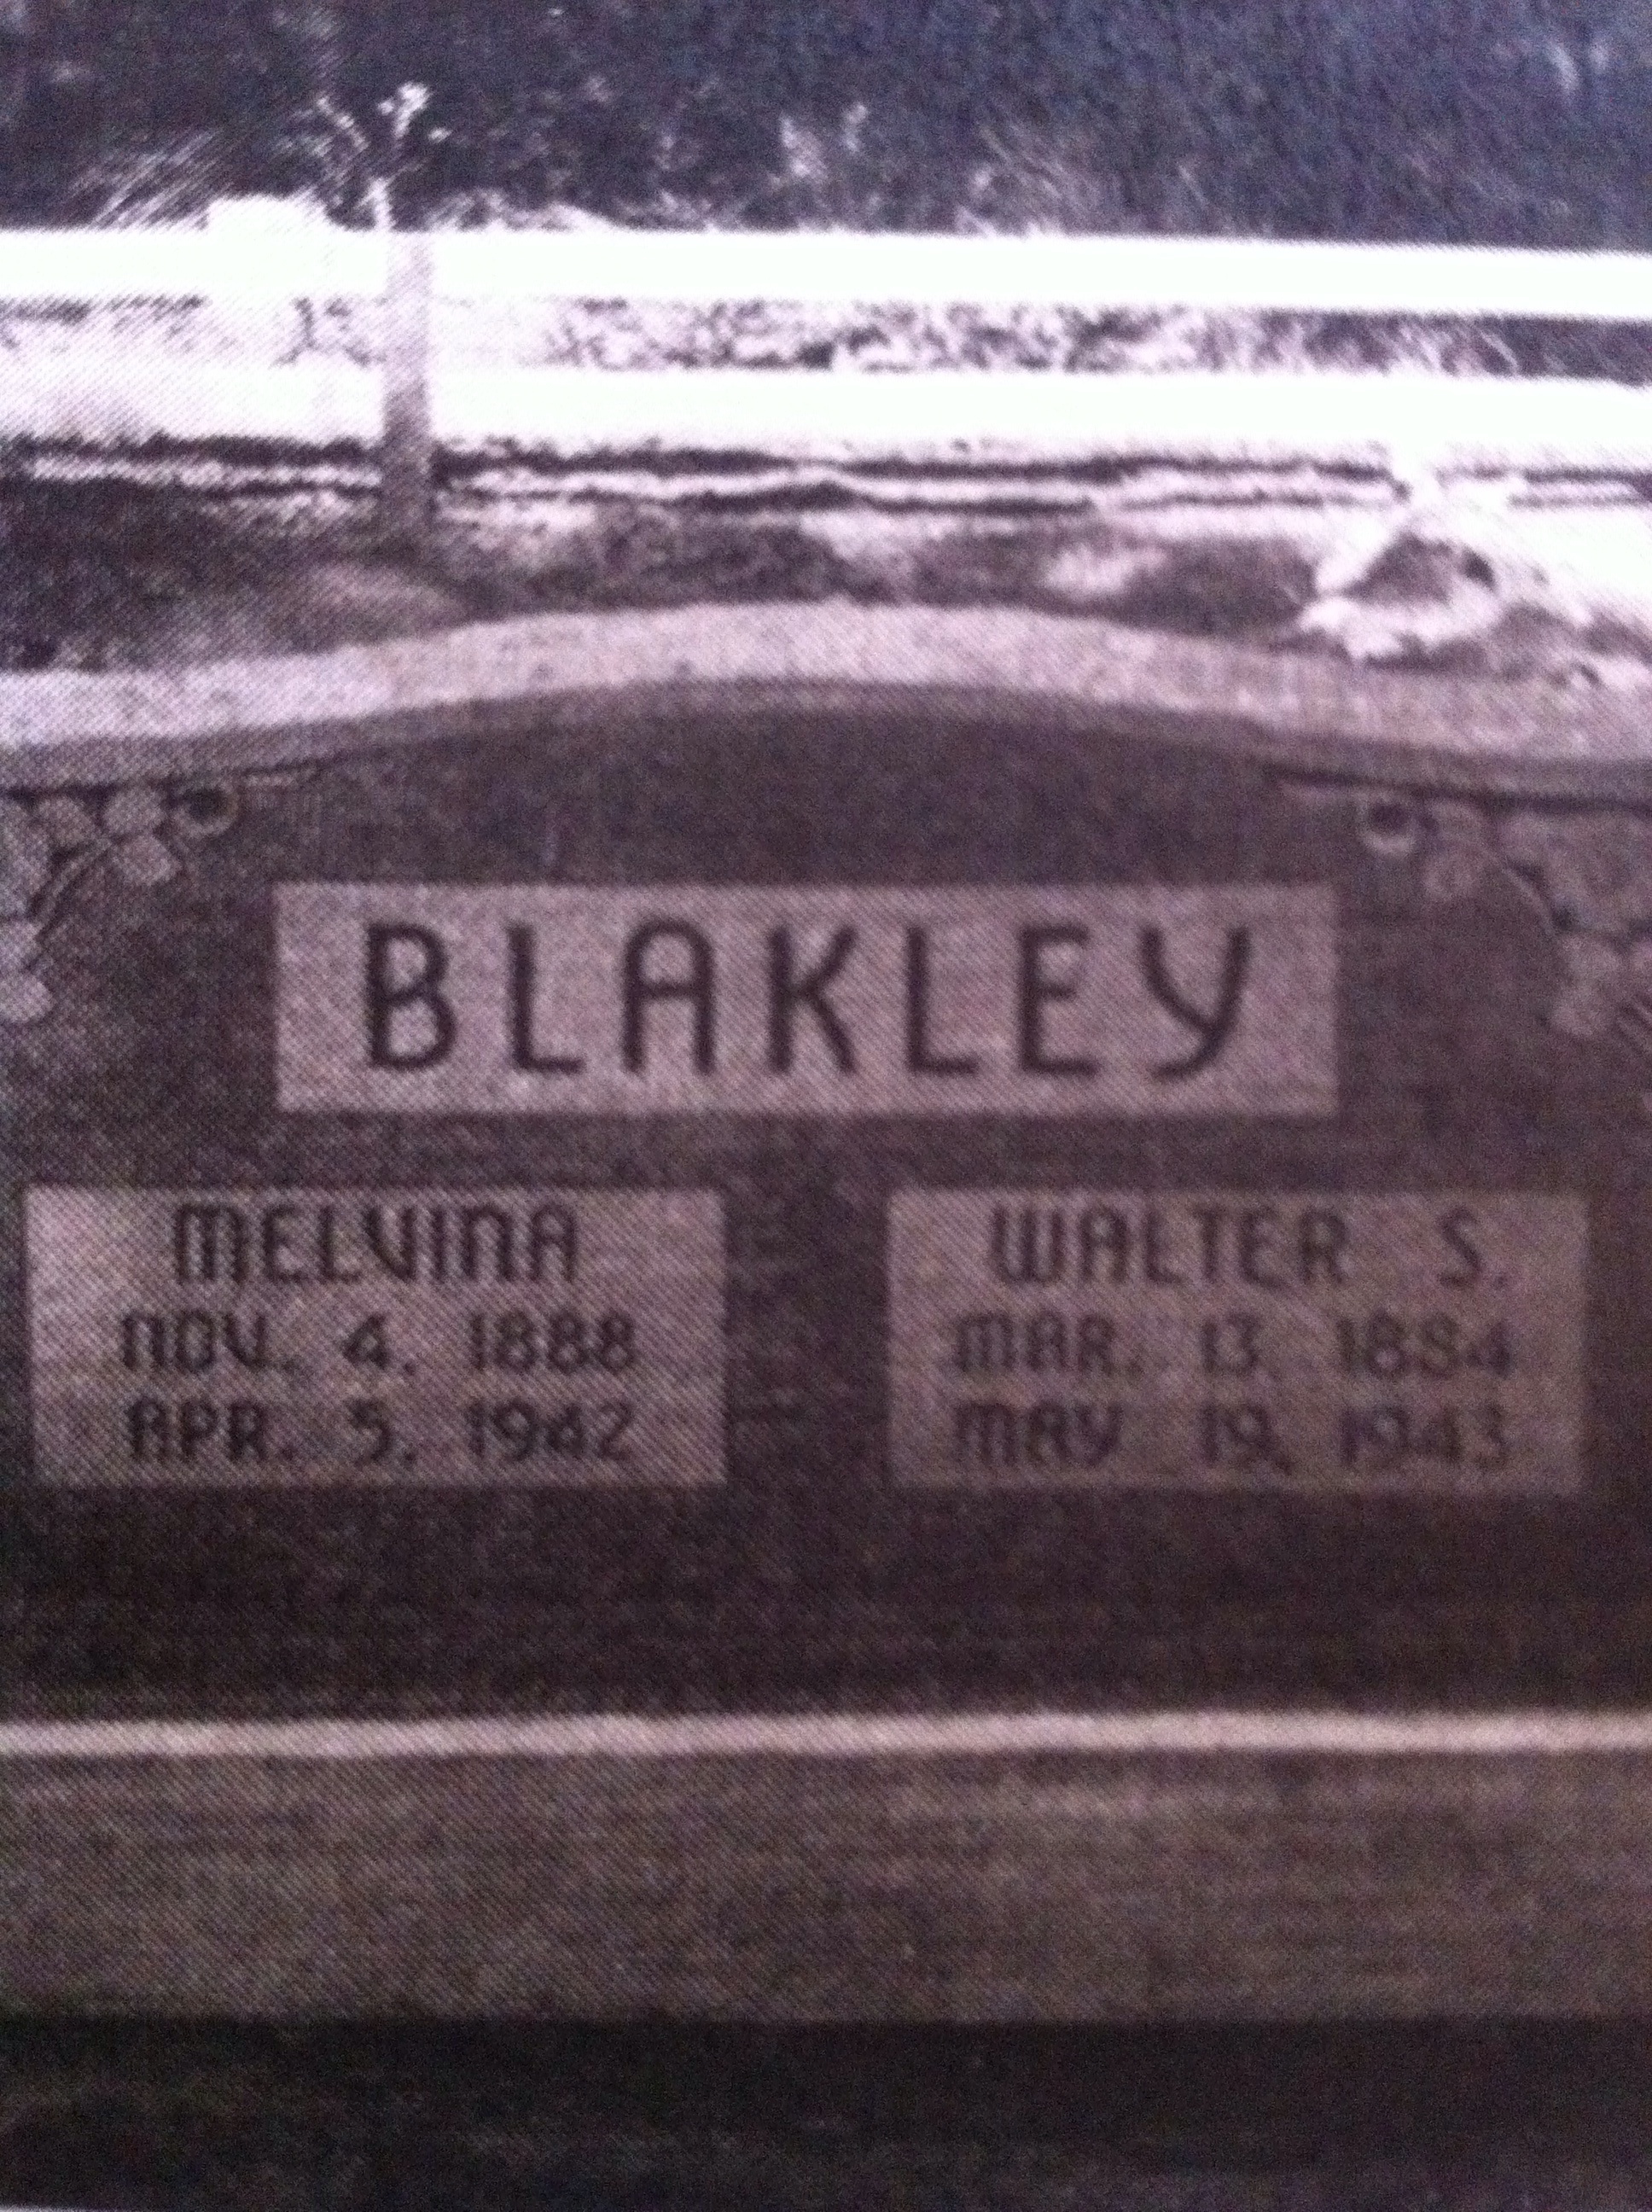 Walter Blakely